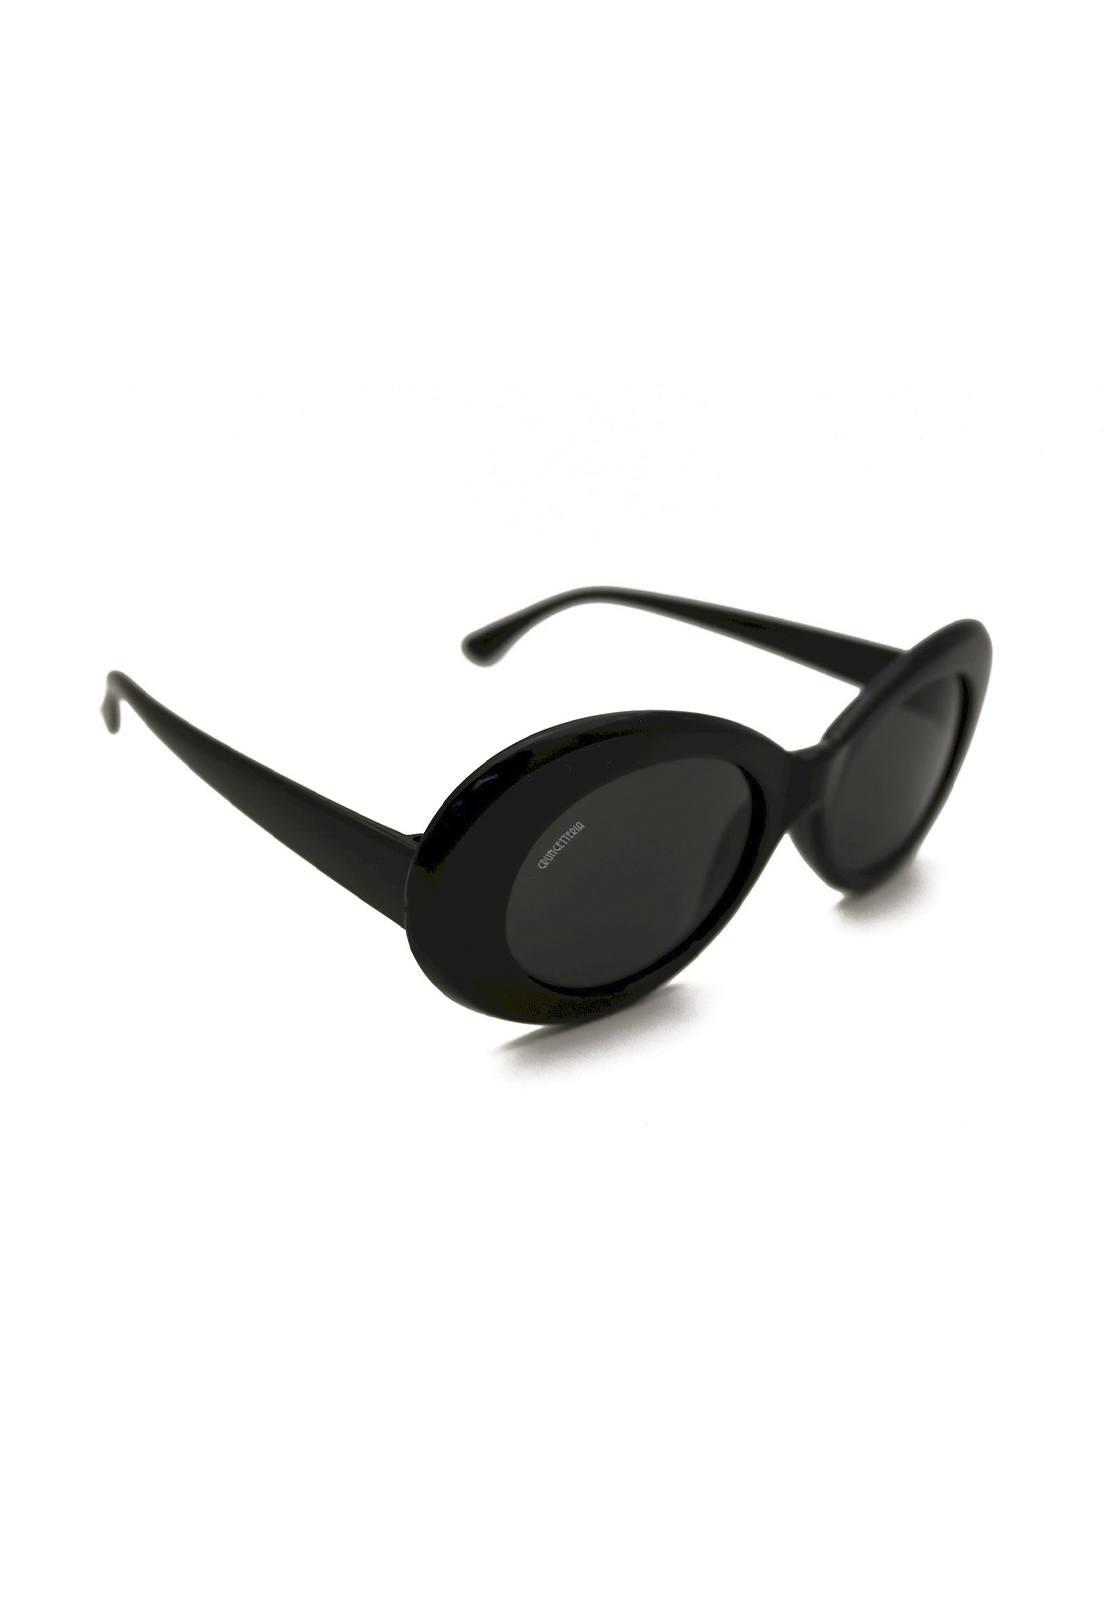 Óculos de Sol Grungetteria Kurt Preto